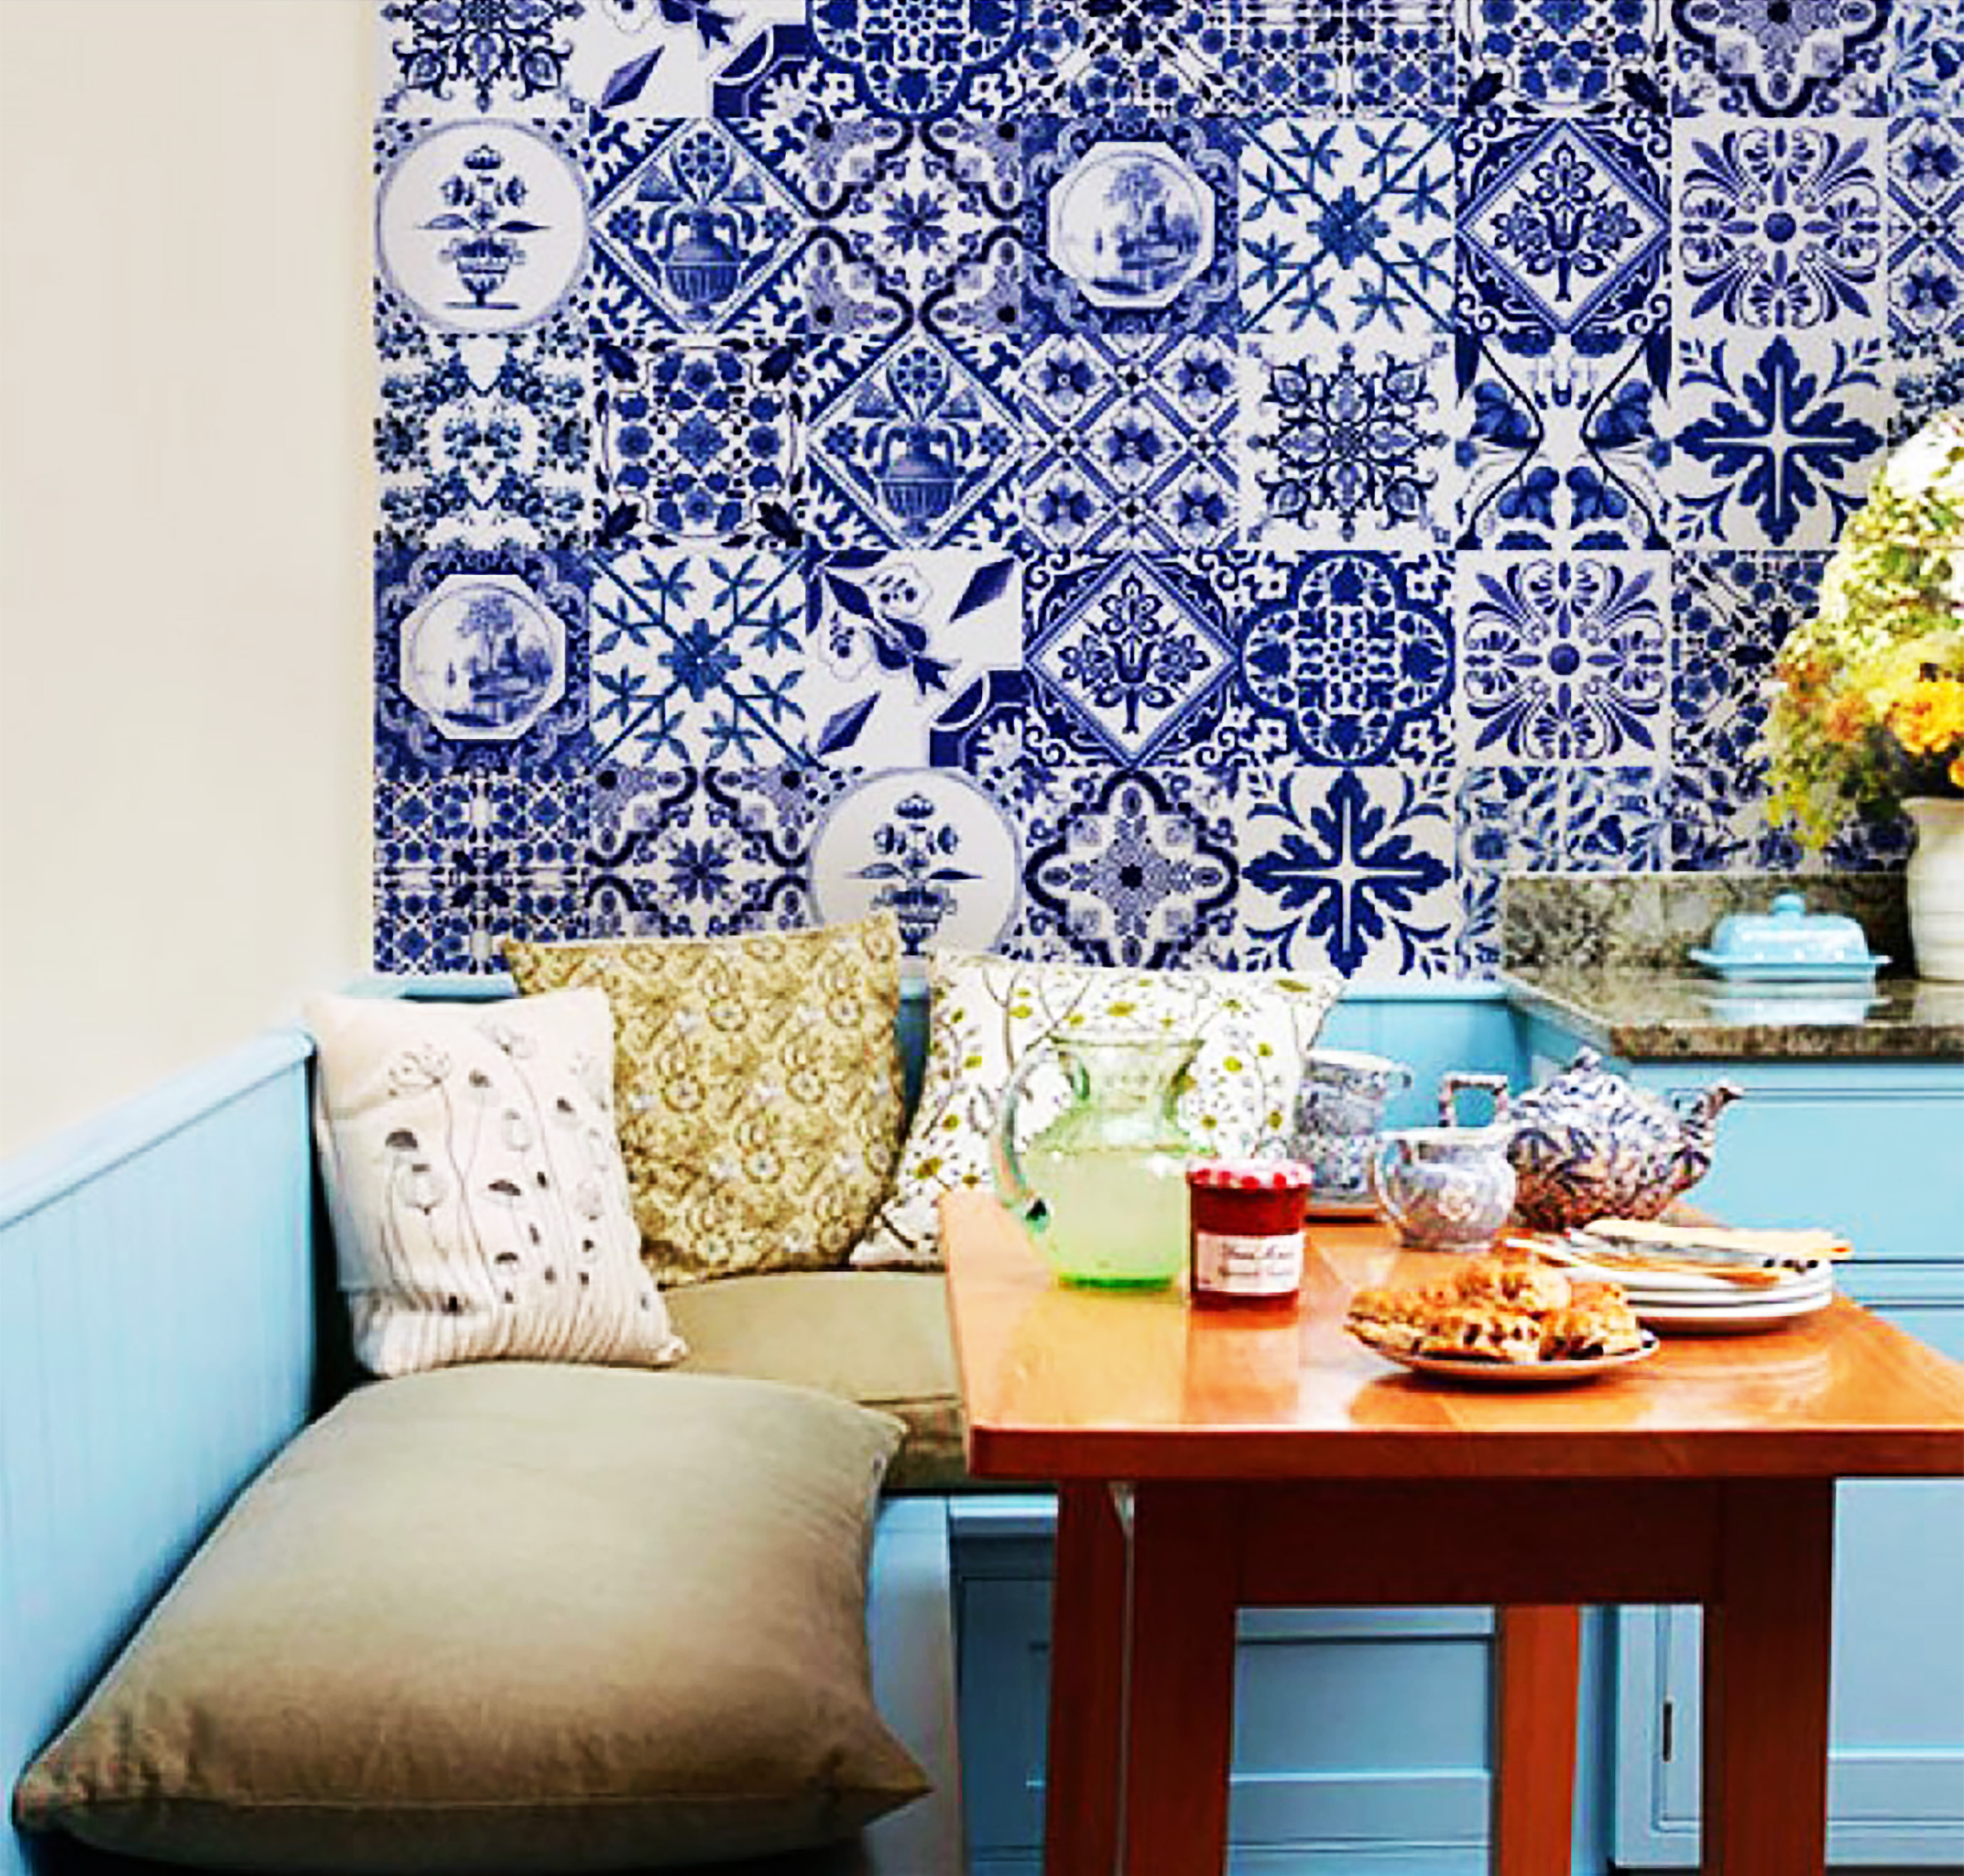 azulejos-portugueses-2.jpg